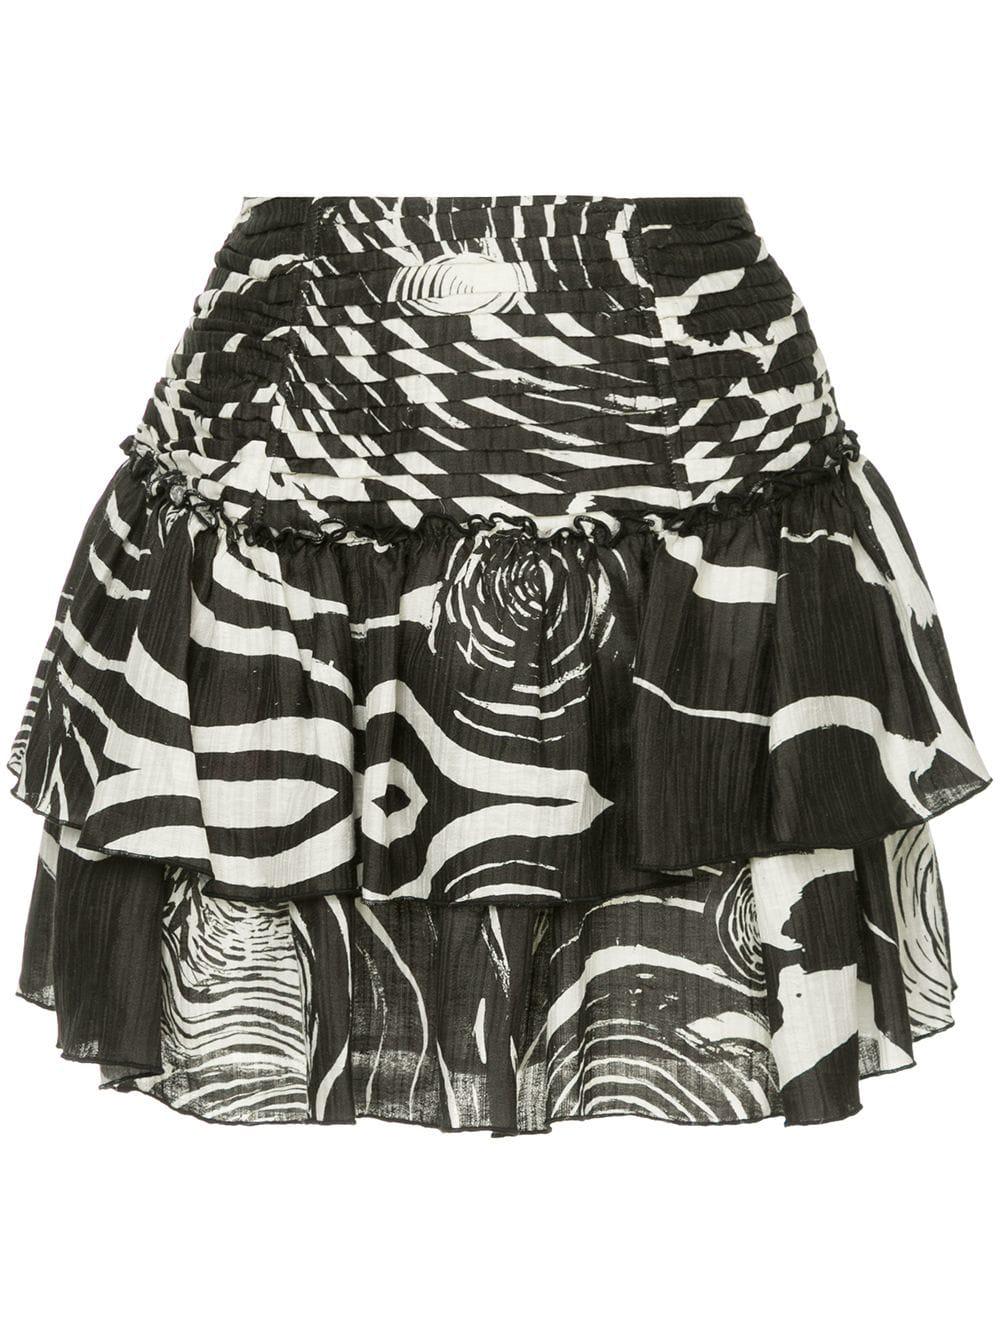 3cf95f9c26 Select Size. Store Status Price. Aje Violet Mini Skirt In White